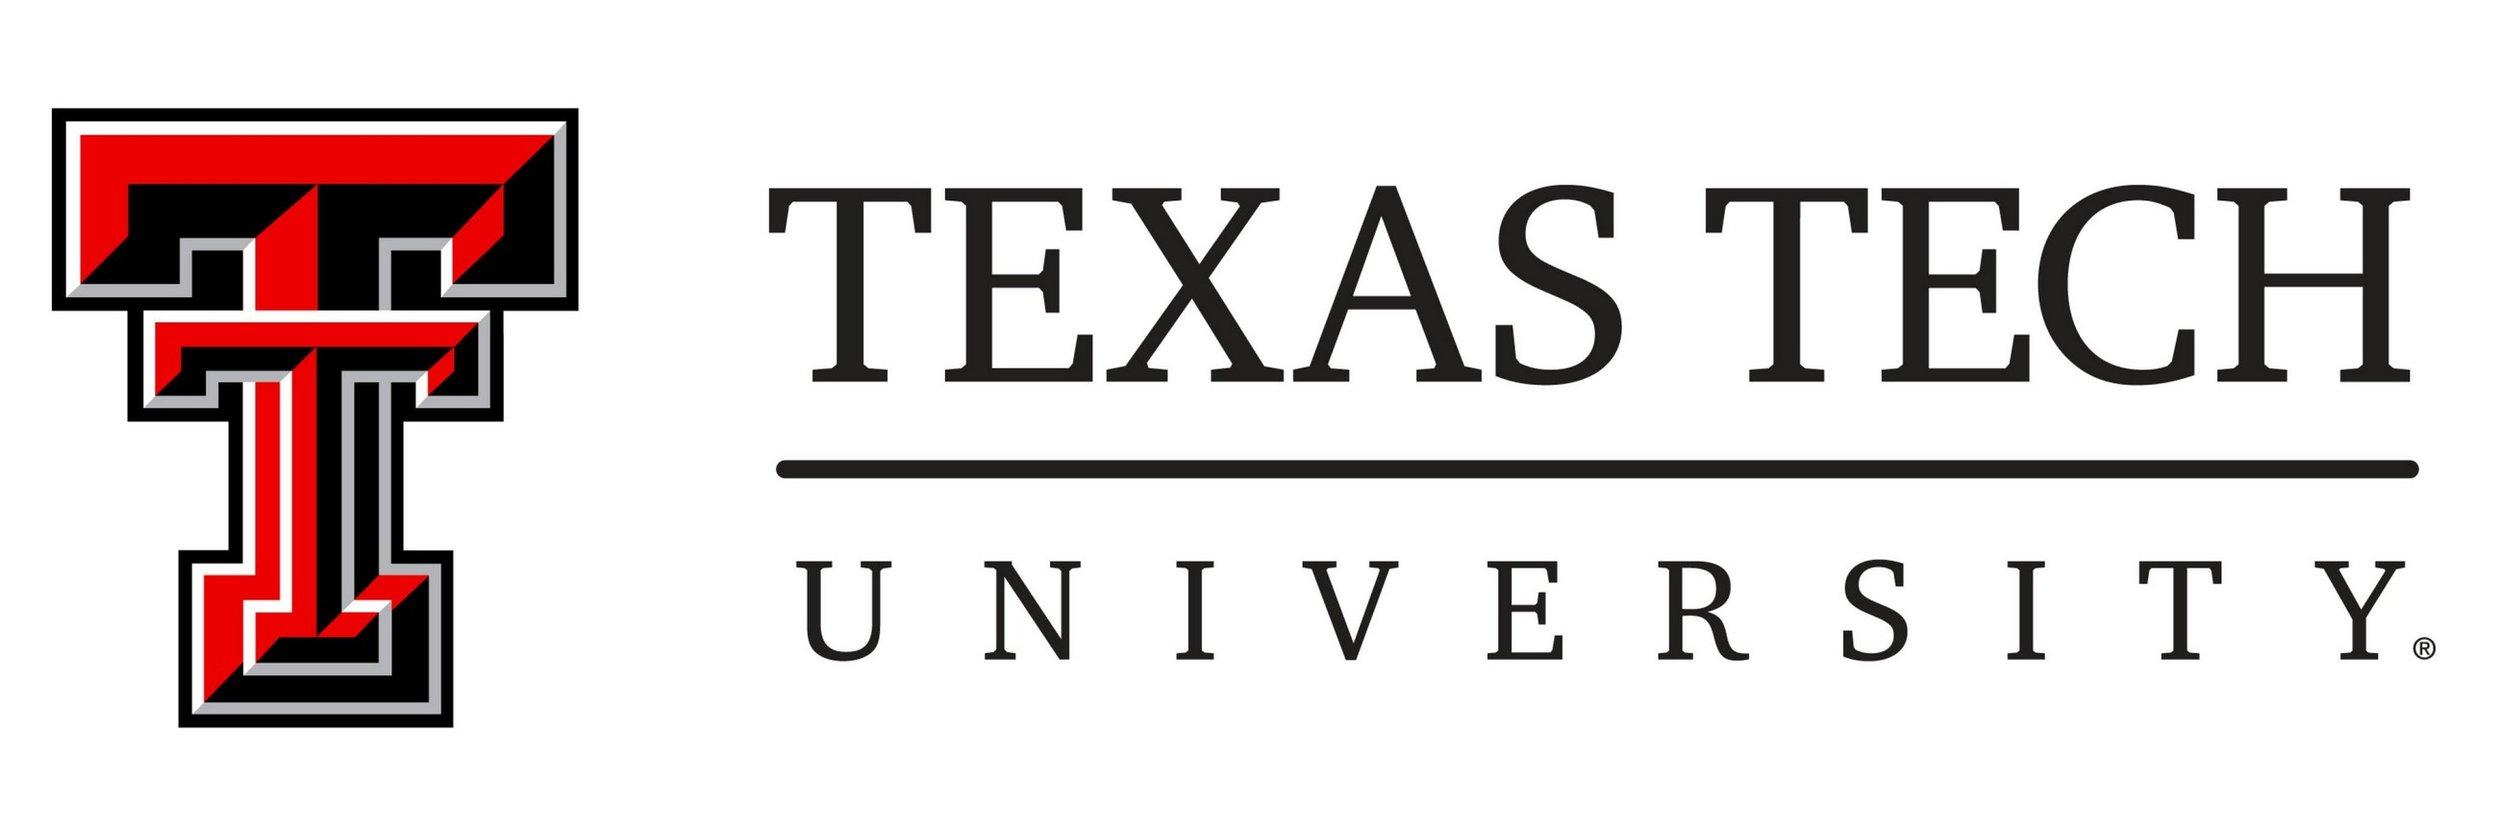 texas-tech-university-system-a-dell-compellent-customer-profile.jpg